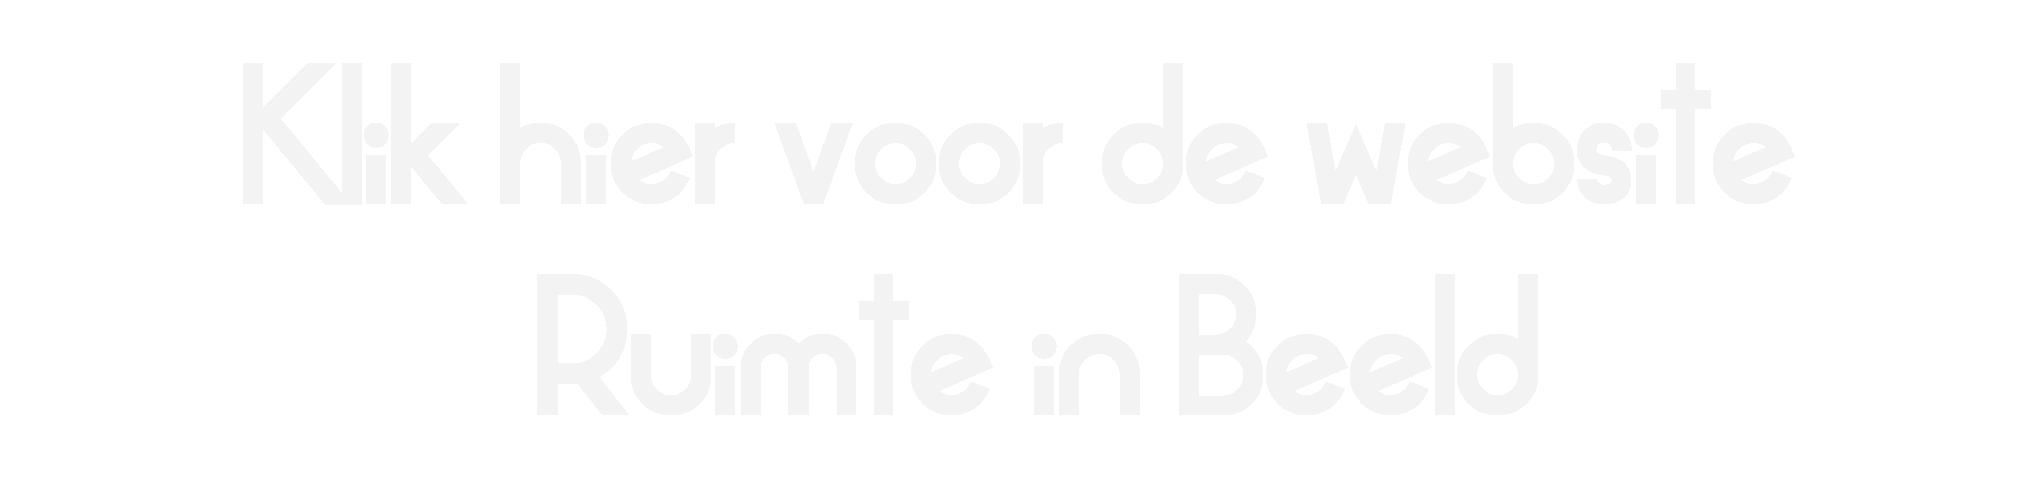 knop_RuimteInBeeld